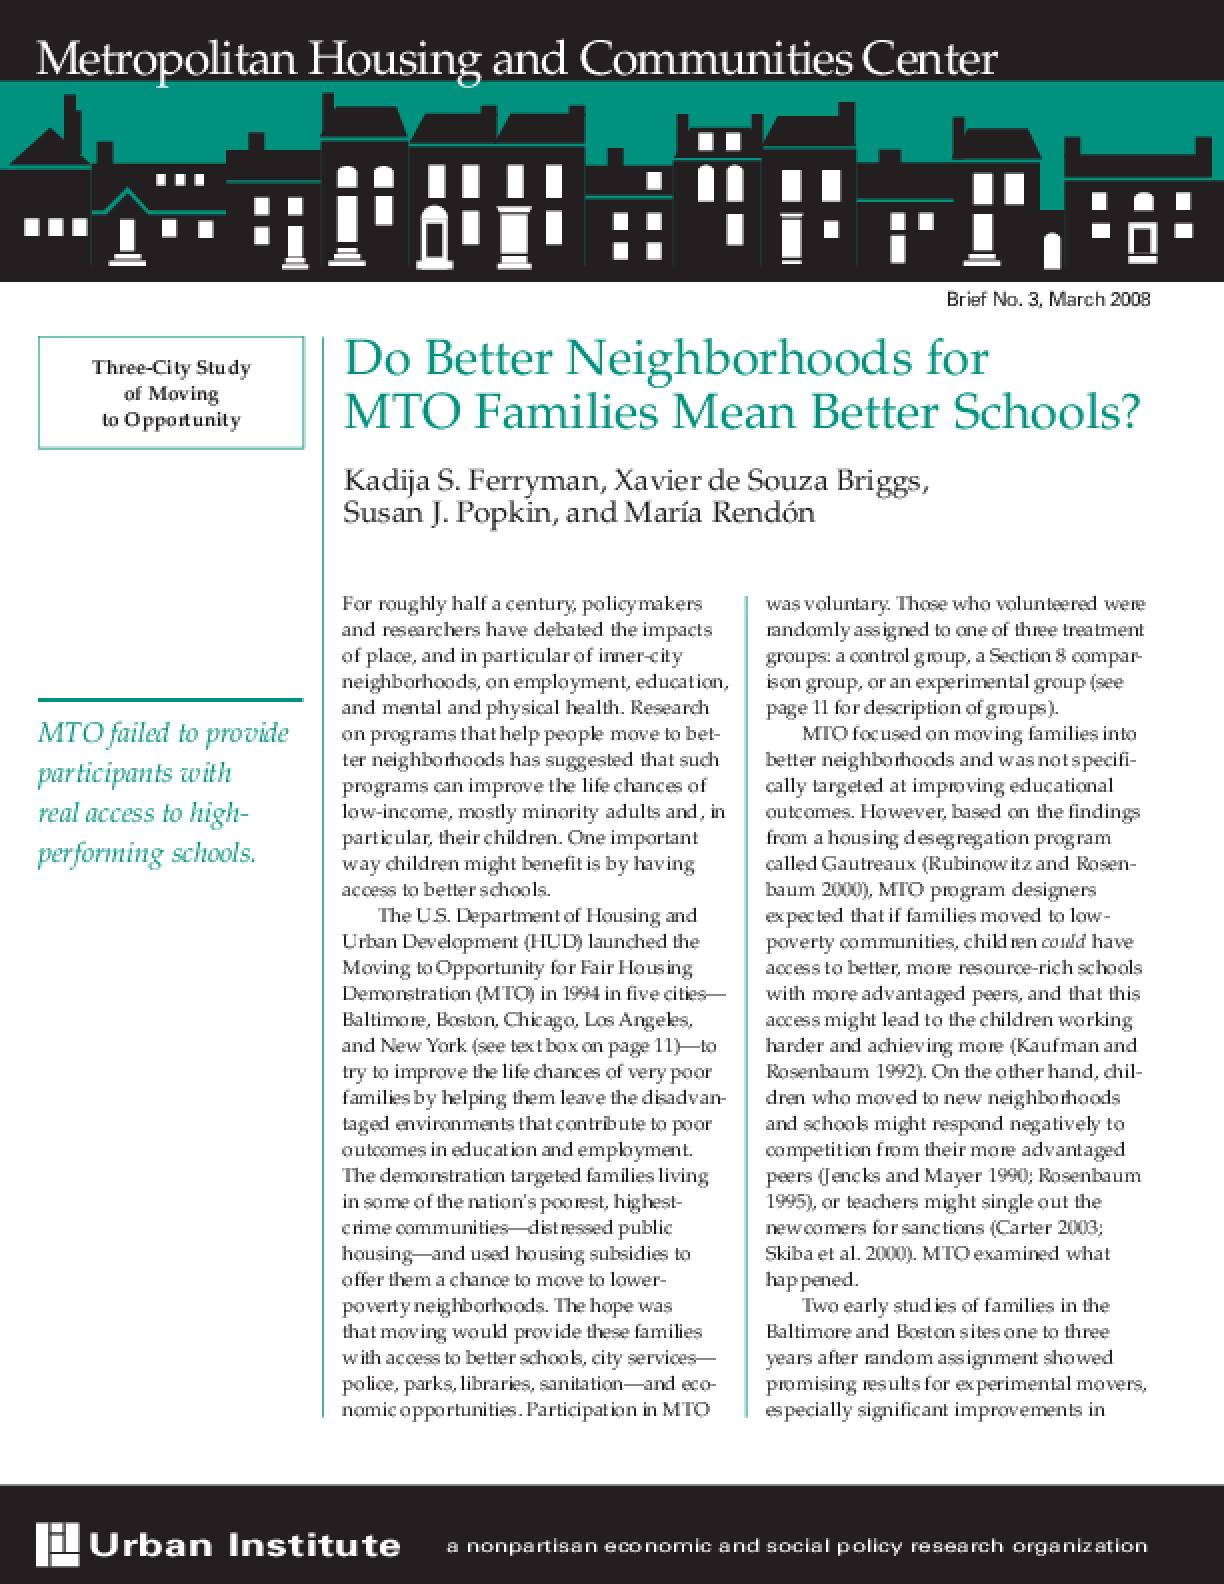 Do Better Neighborhoods for MTO Families Mean Better Schools?